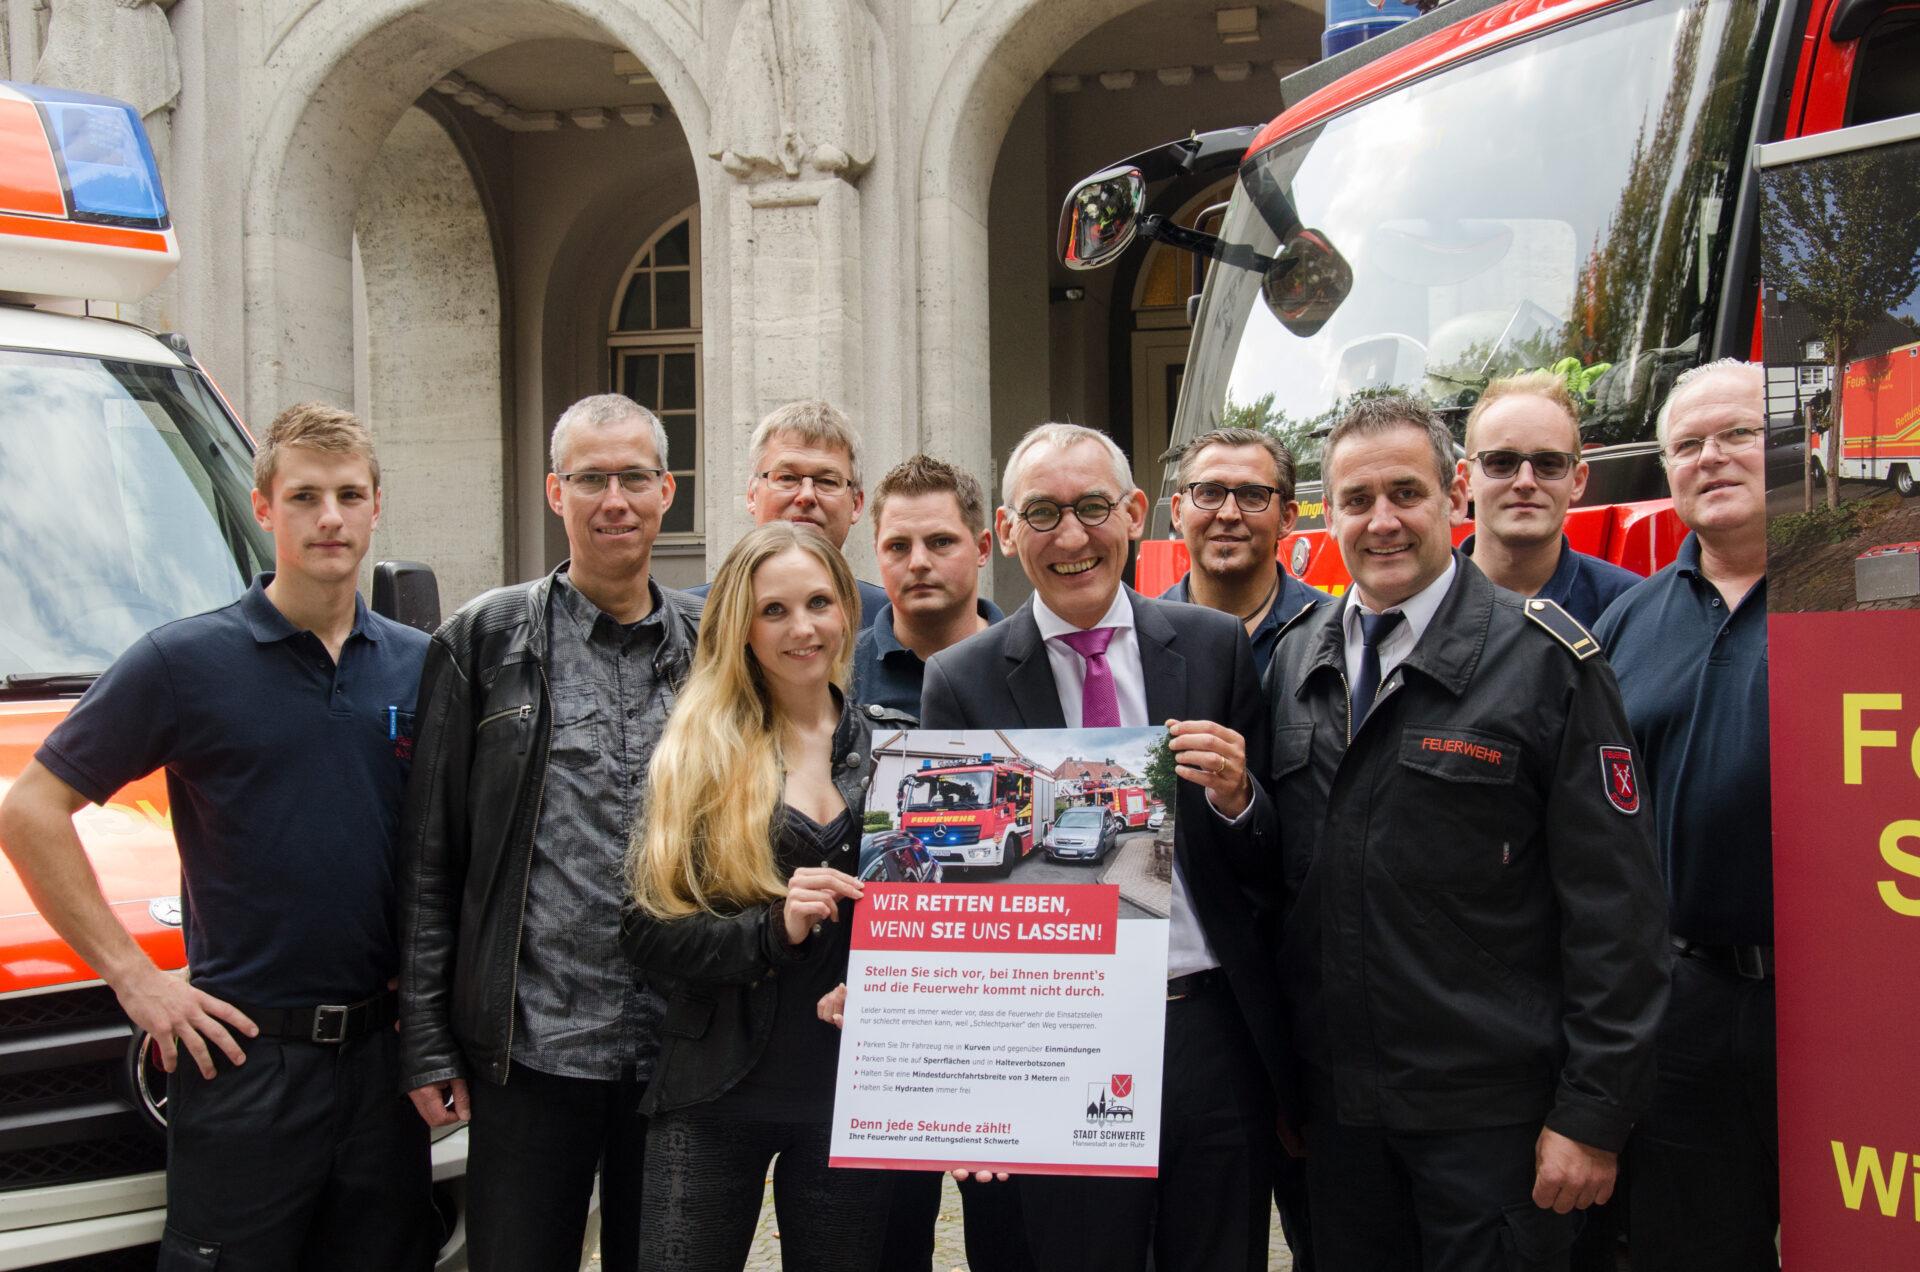 Flyer-Kampagne: Falschparker blockieren Rettungsfahrzeuge